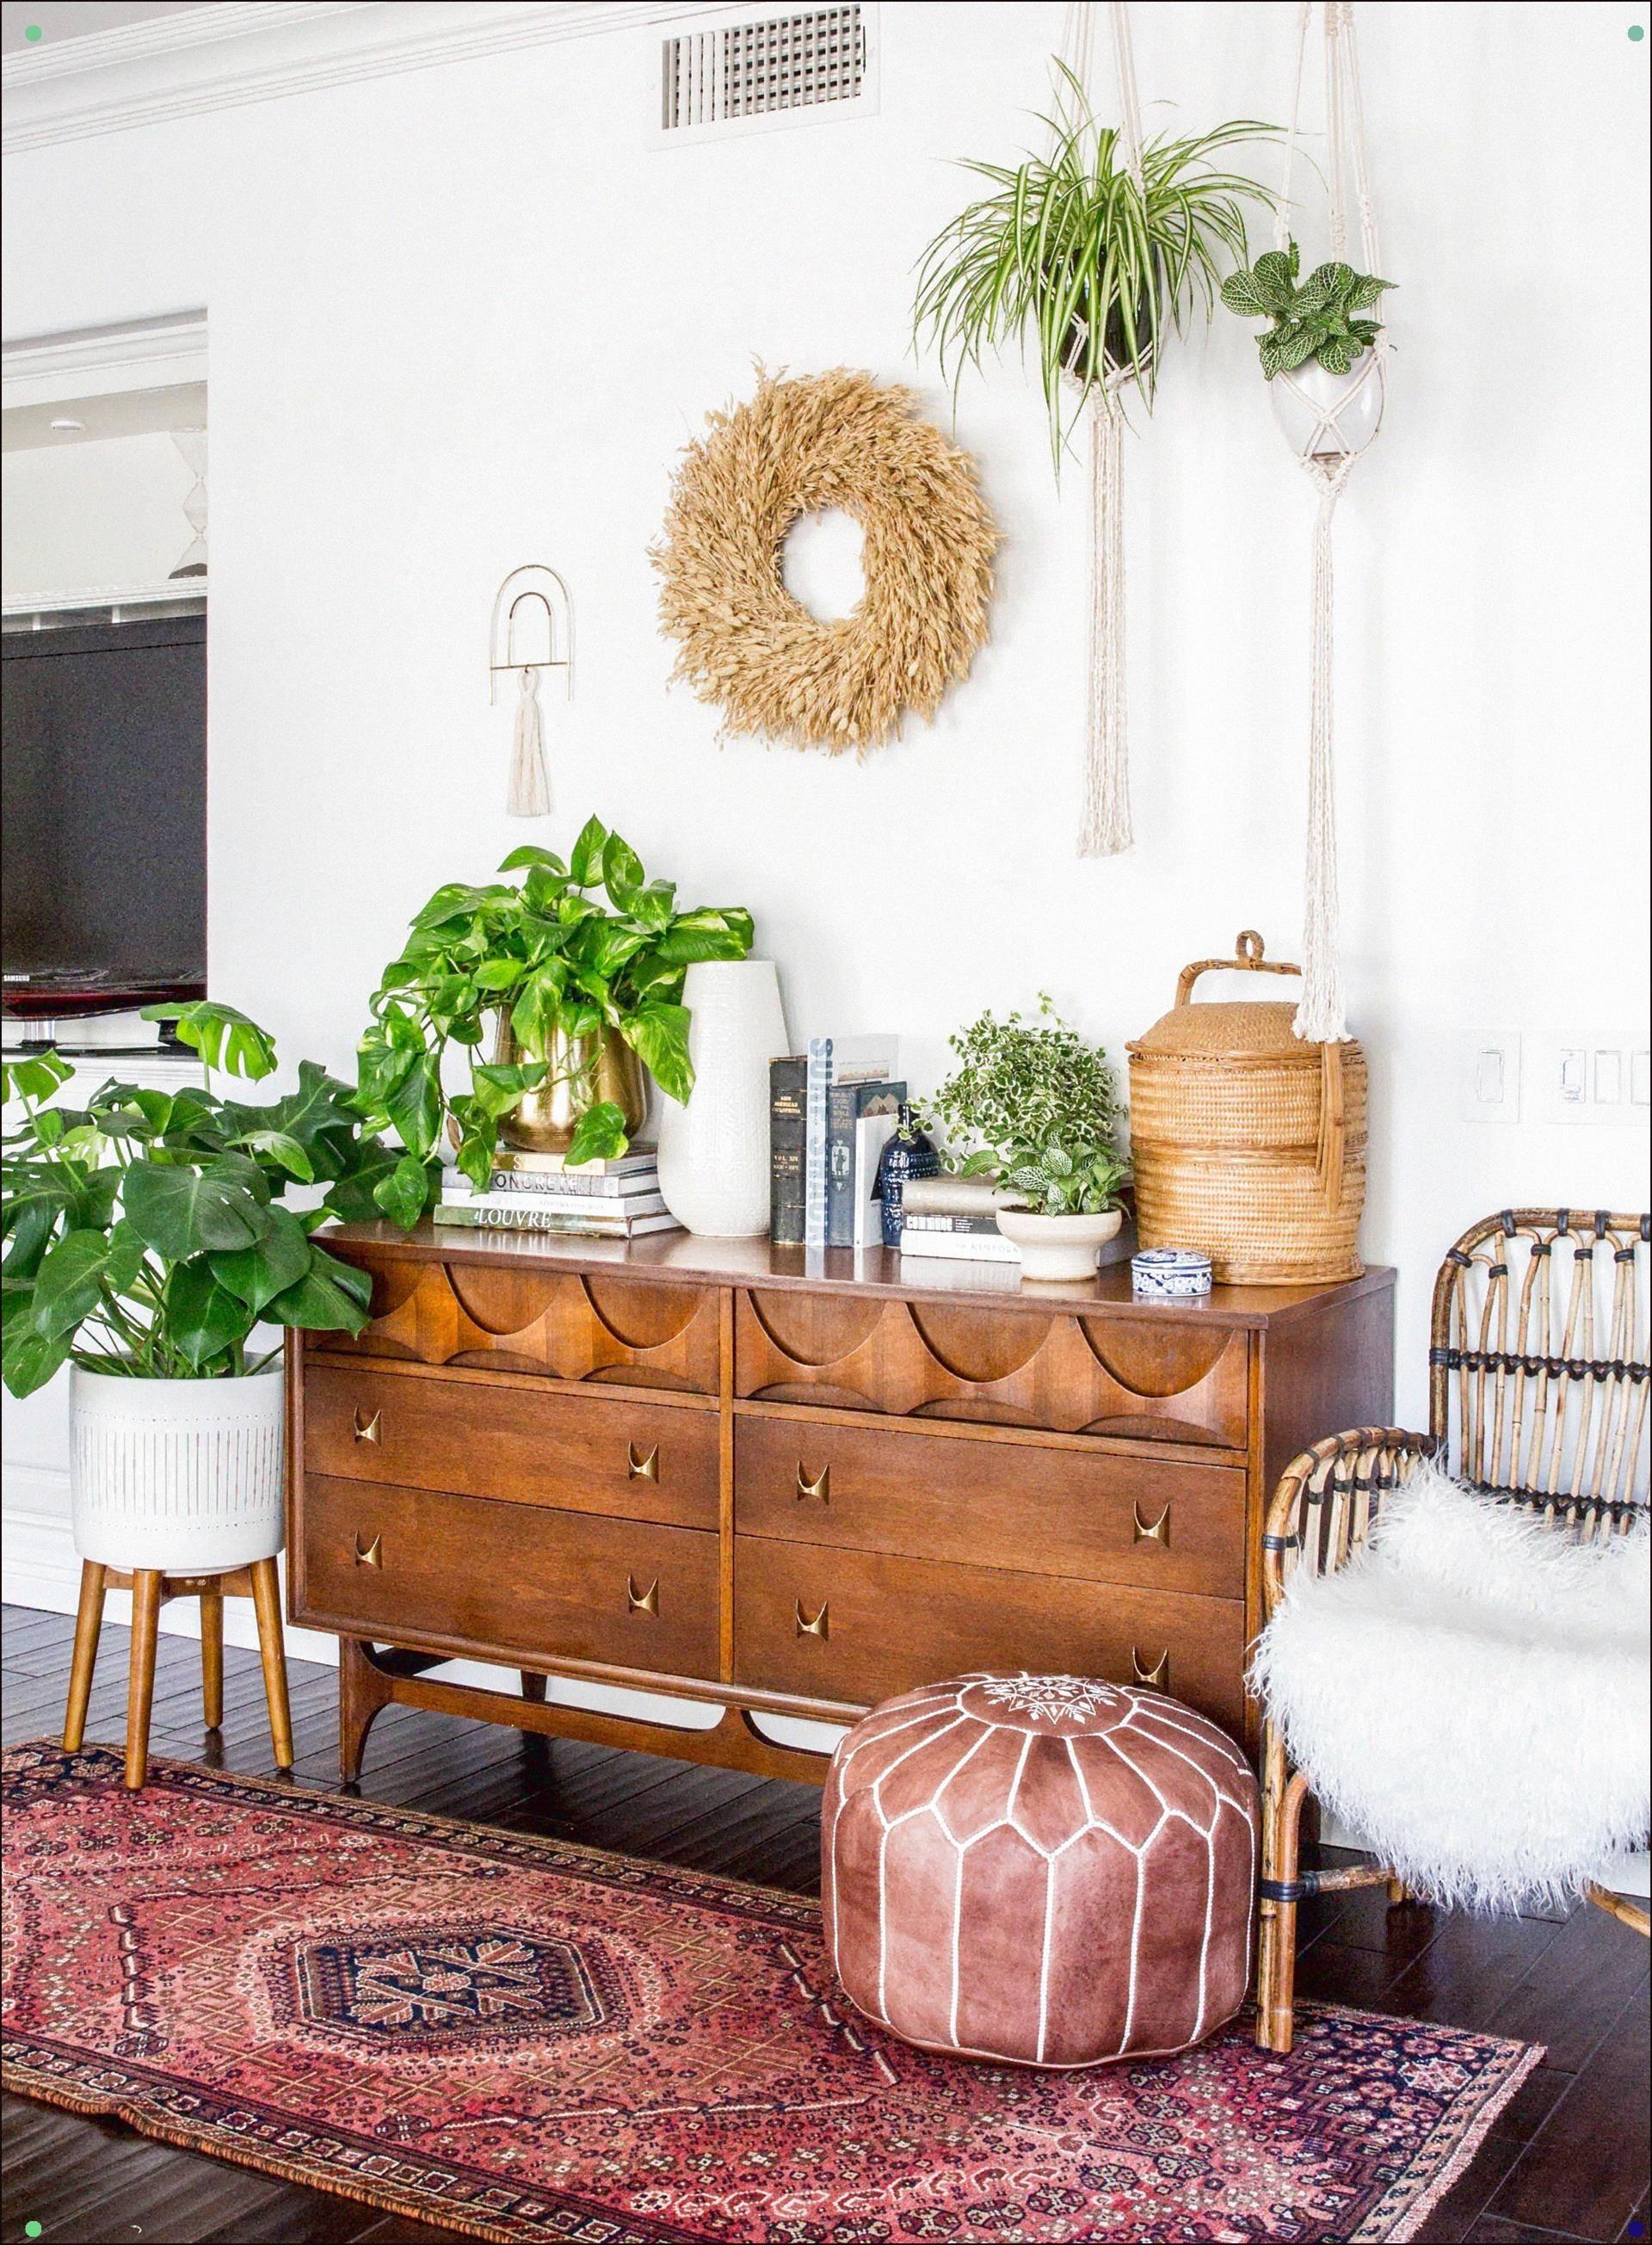 Spring Florals And Plants For Your Home Anita Yokota Ready For Some Color And Bright Accessories I Home Decor Retro Home Decor Interior Design Living Room Warm Living room decor accessories